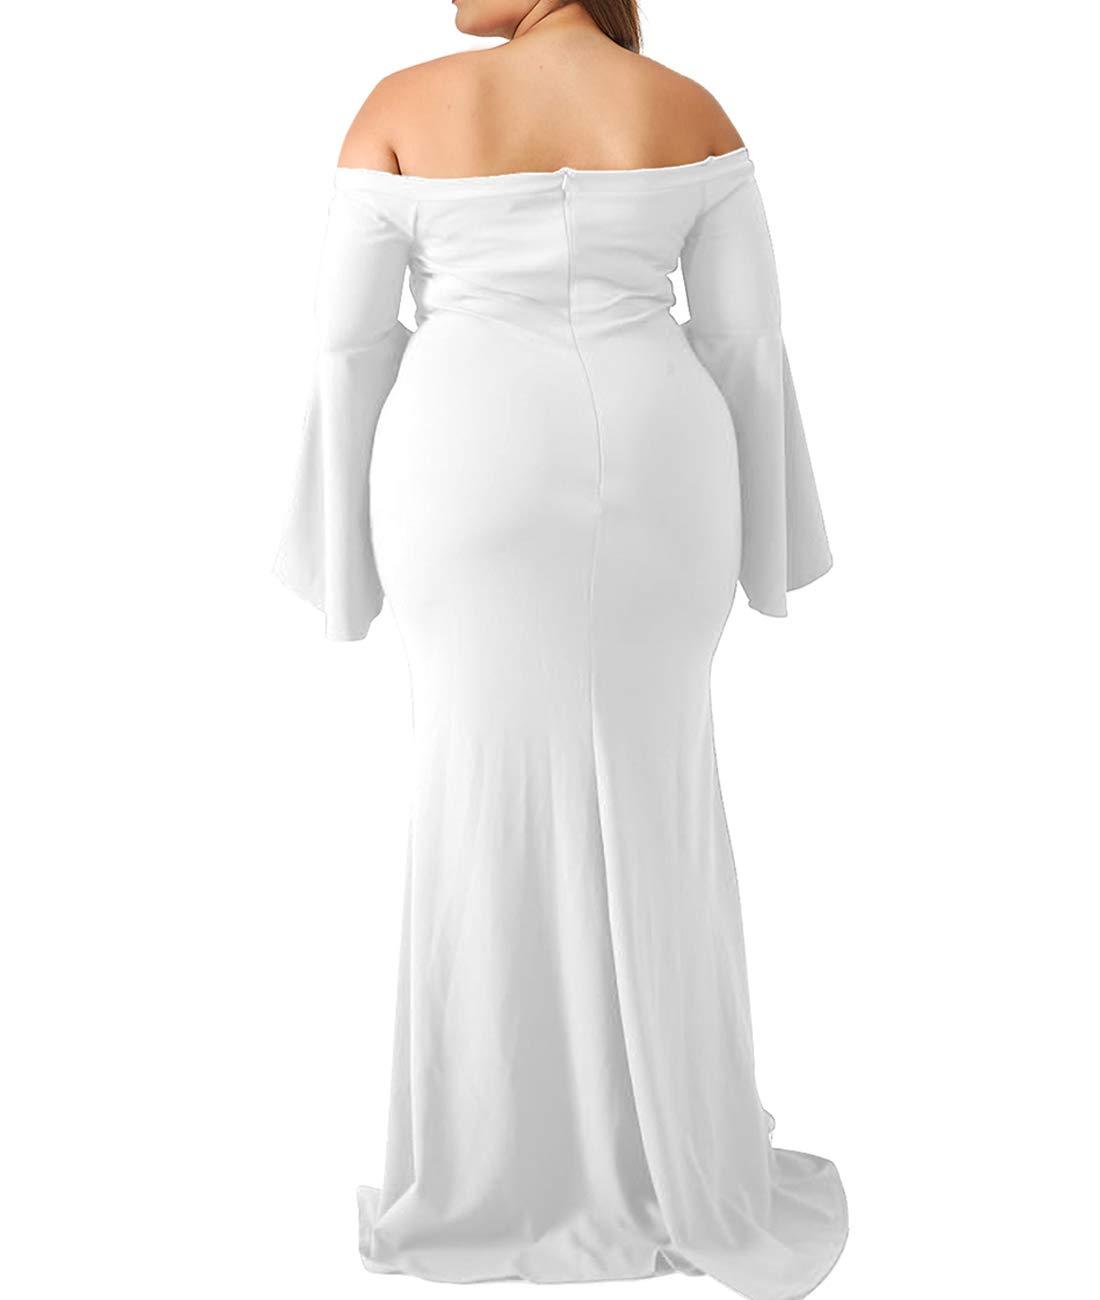 276ab5d142e ... Plus/Innerger Women Plus Size Off Shoulder Bodycon Party Dress Evening  Formal Gown White XXXXL. ; 